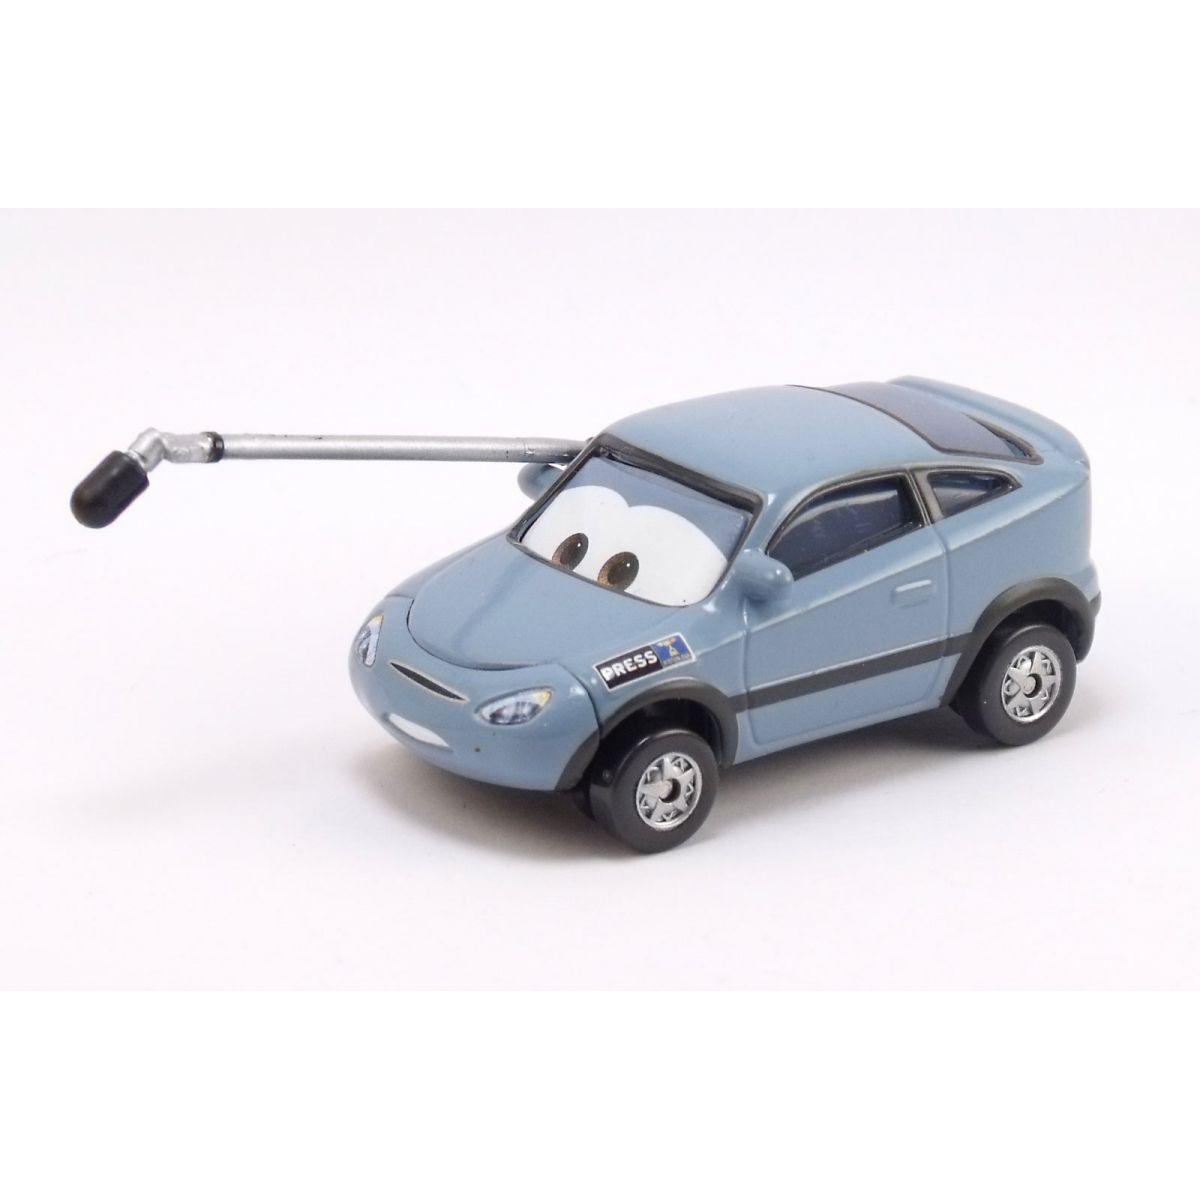 Disney Pixar - Cars - Matti  - Hobby Lobby CollectorStore